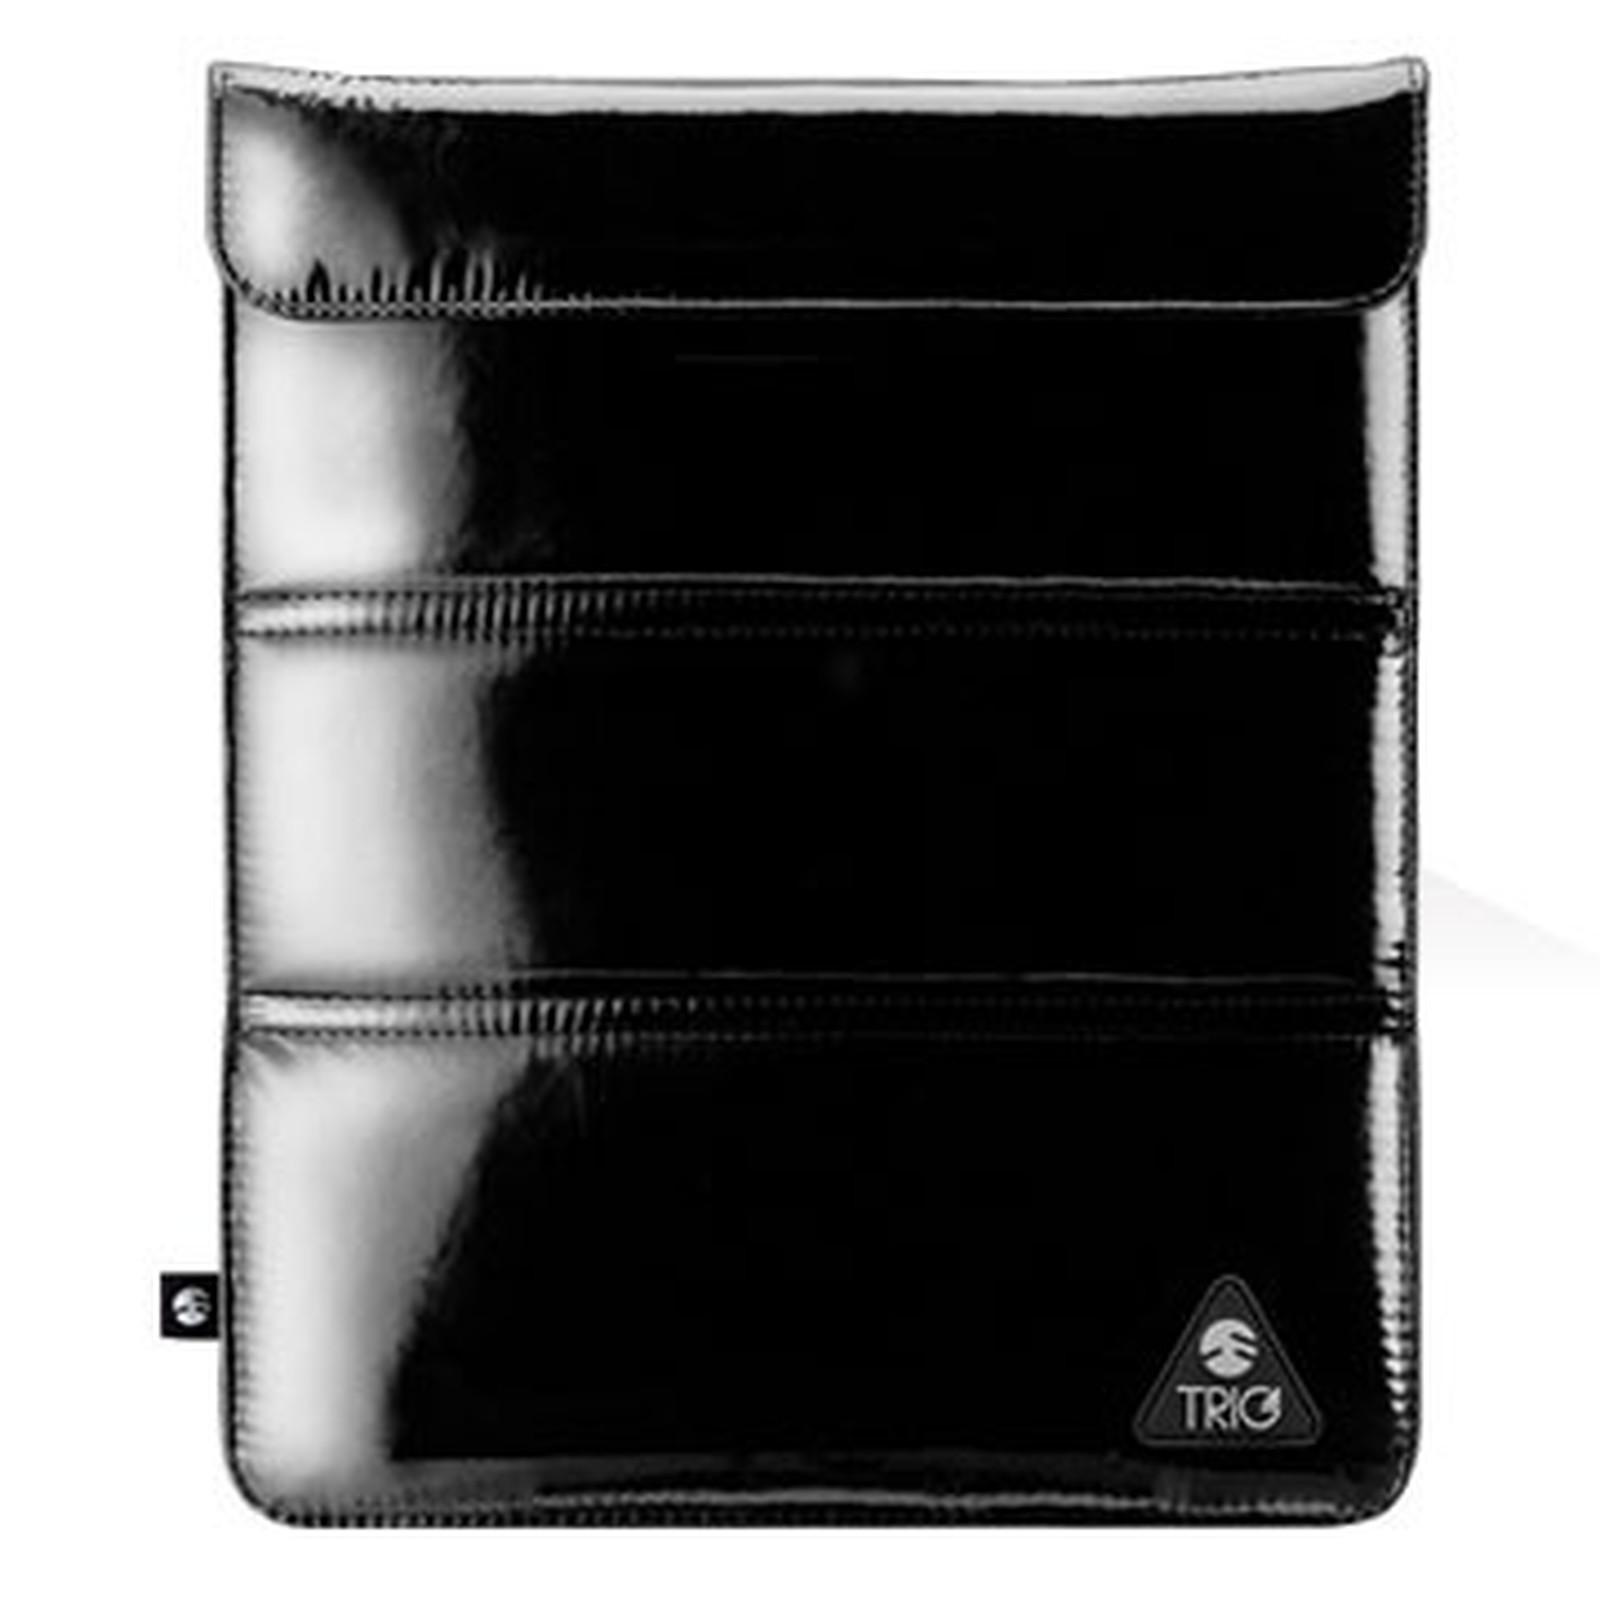 SwitchEasy Trig pour iPad/iPad 2 Noir